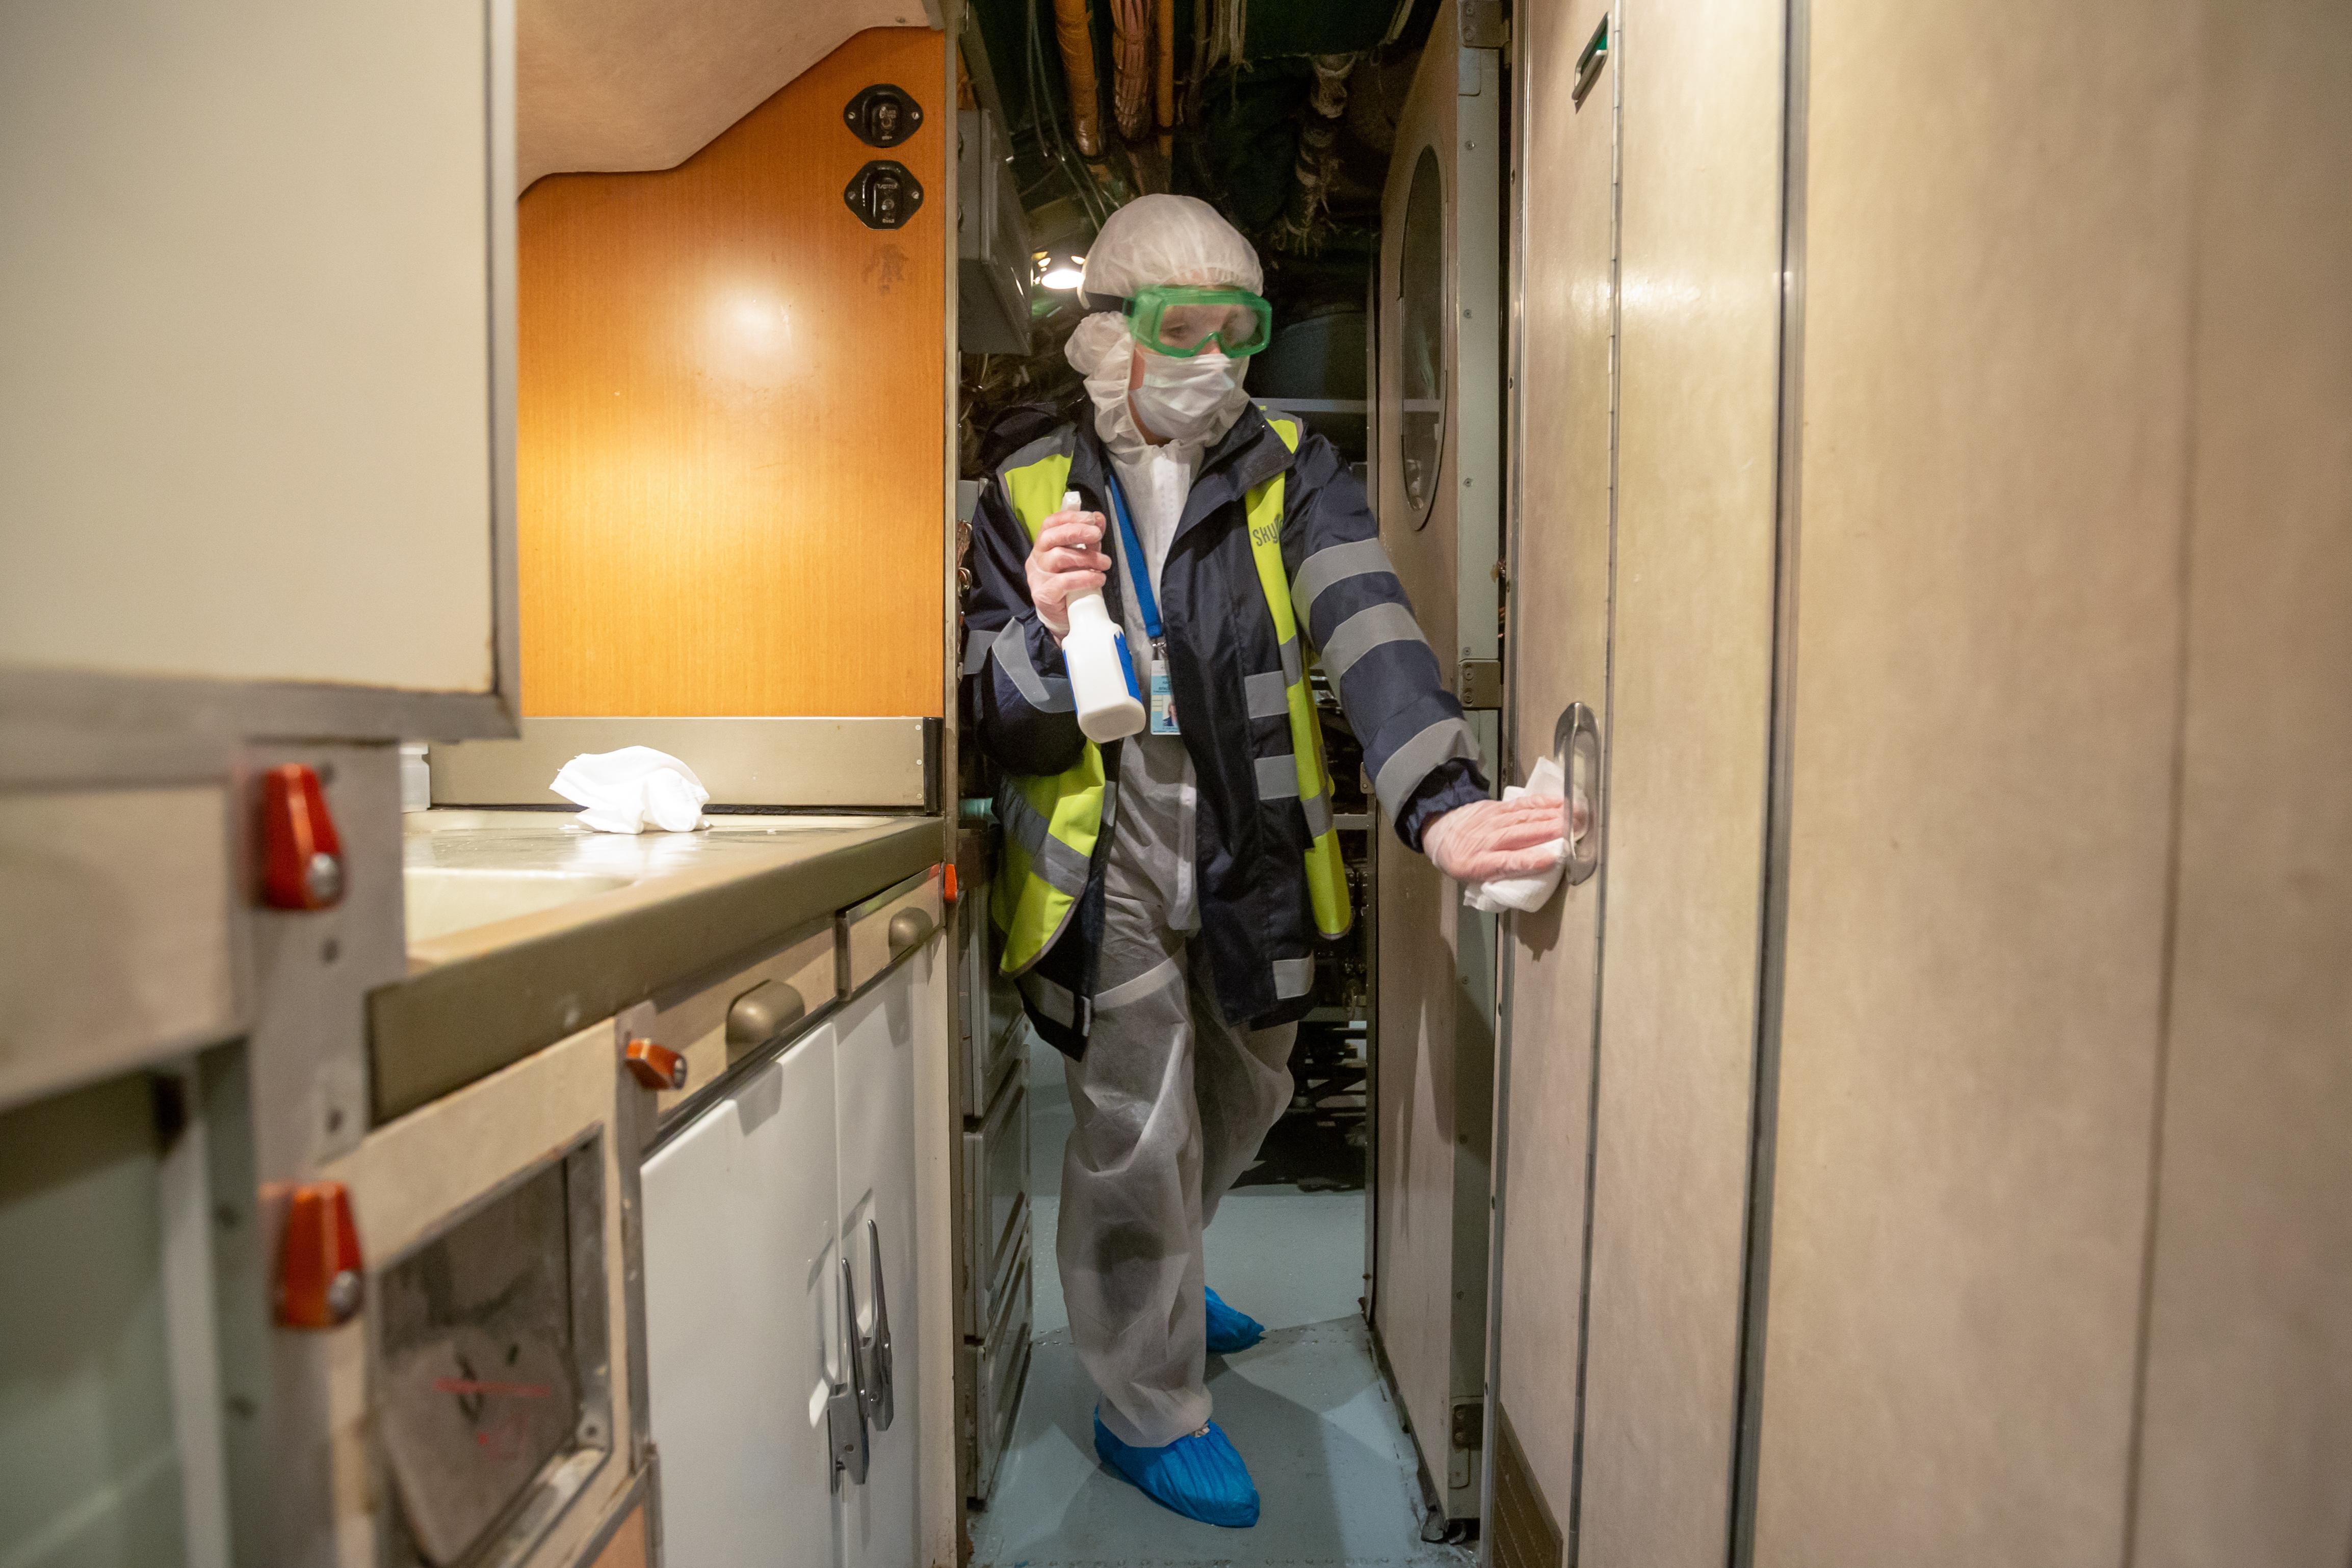 Aeronave sendo desinfectada em época de coronavírus